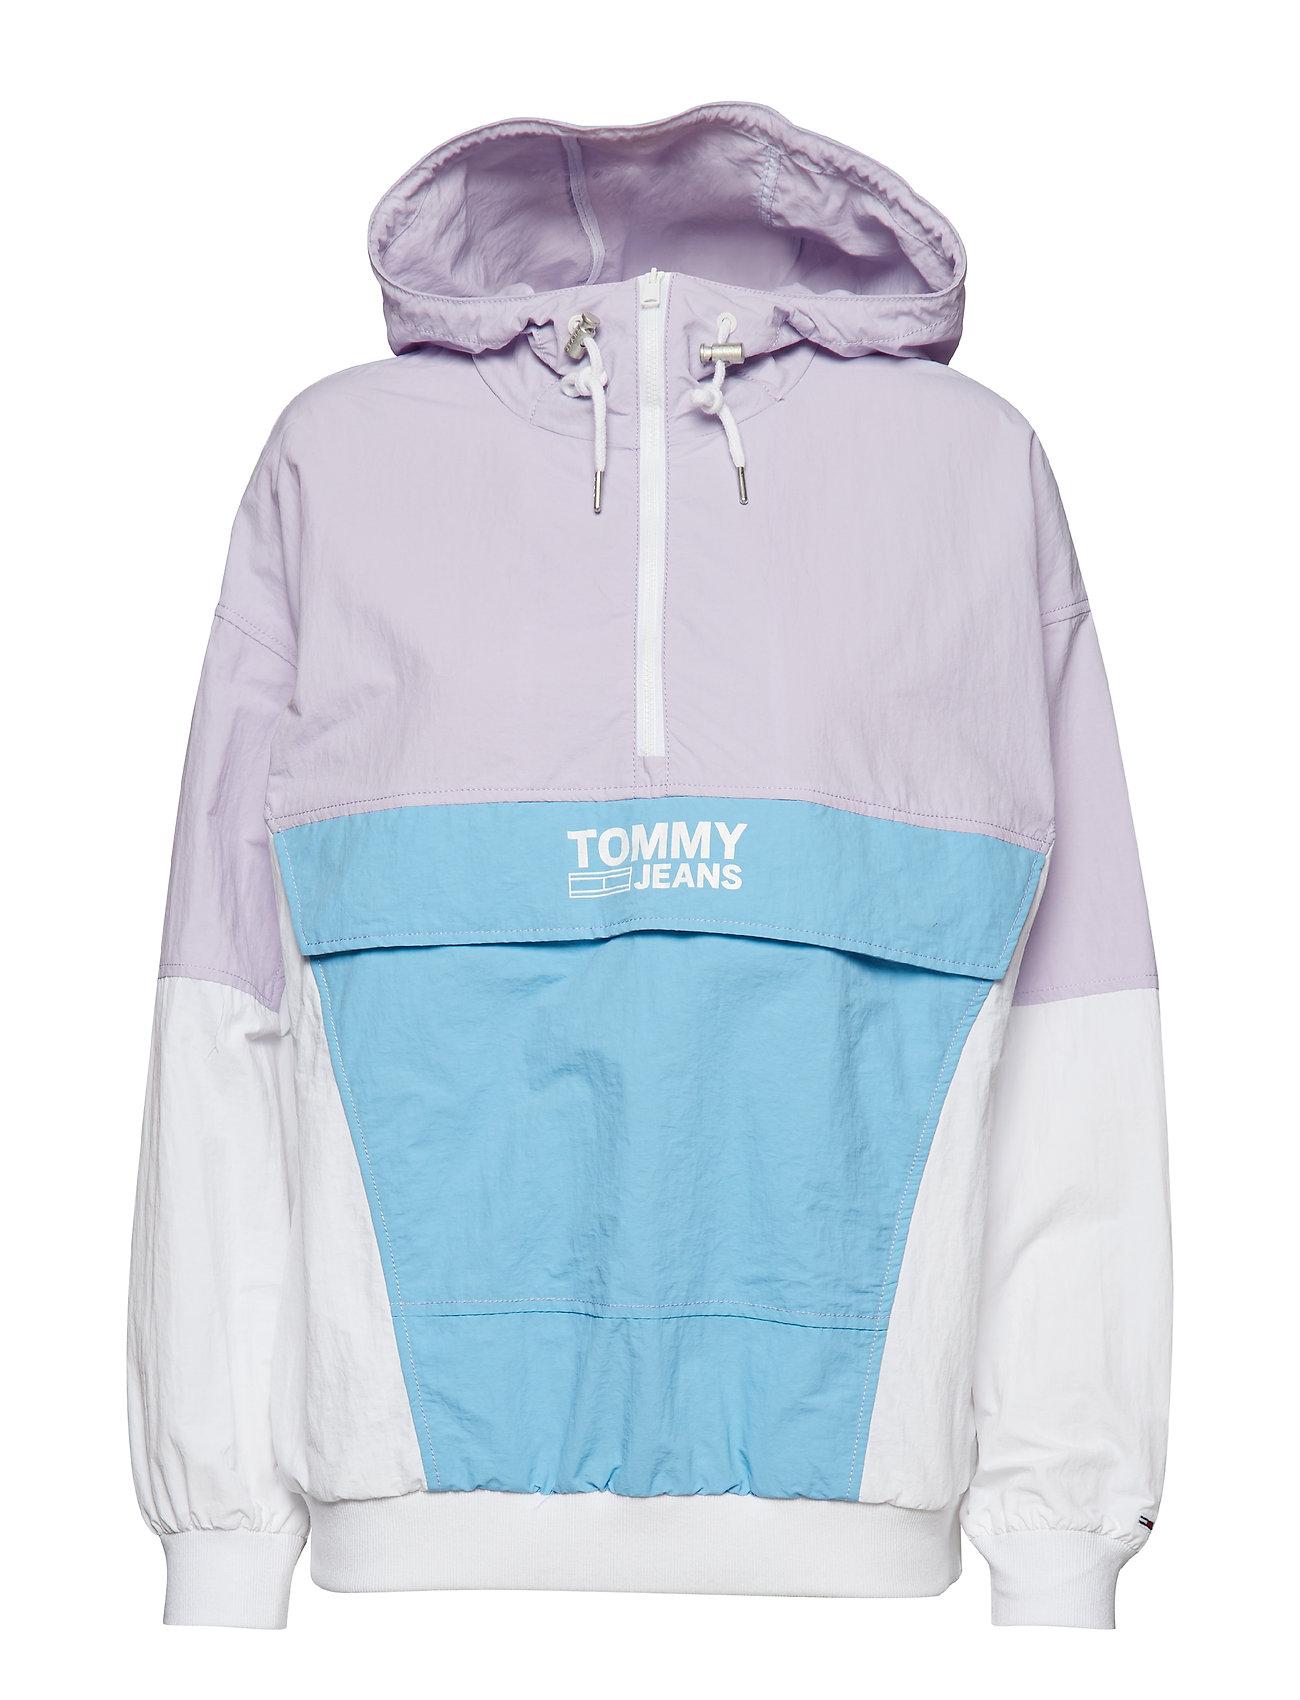 Tommy Jeans TJW RETRO COLORBLOCK POPOVER